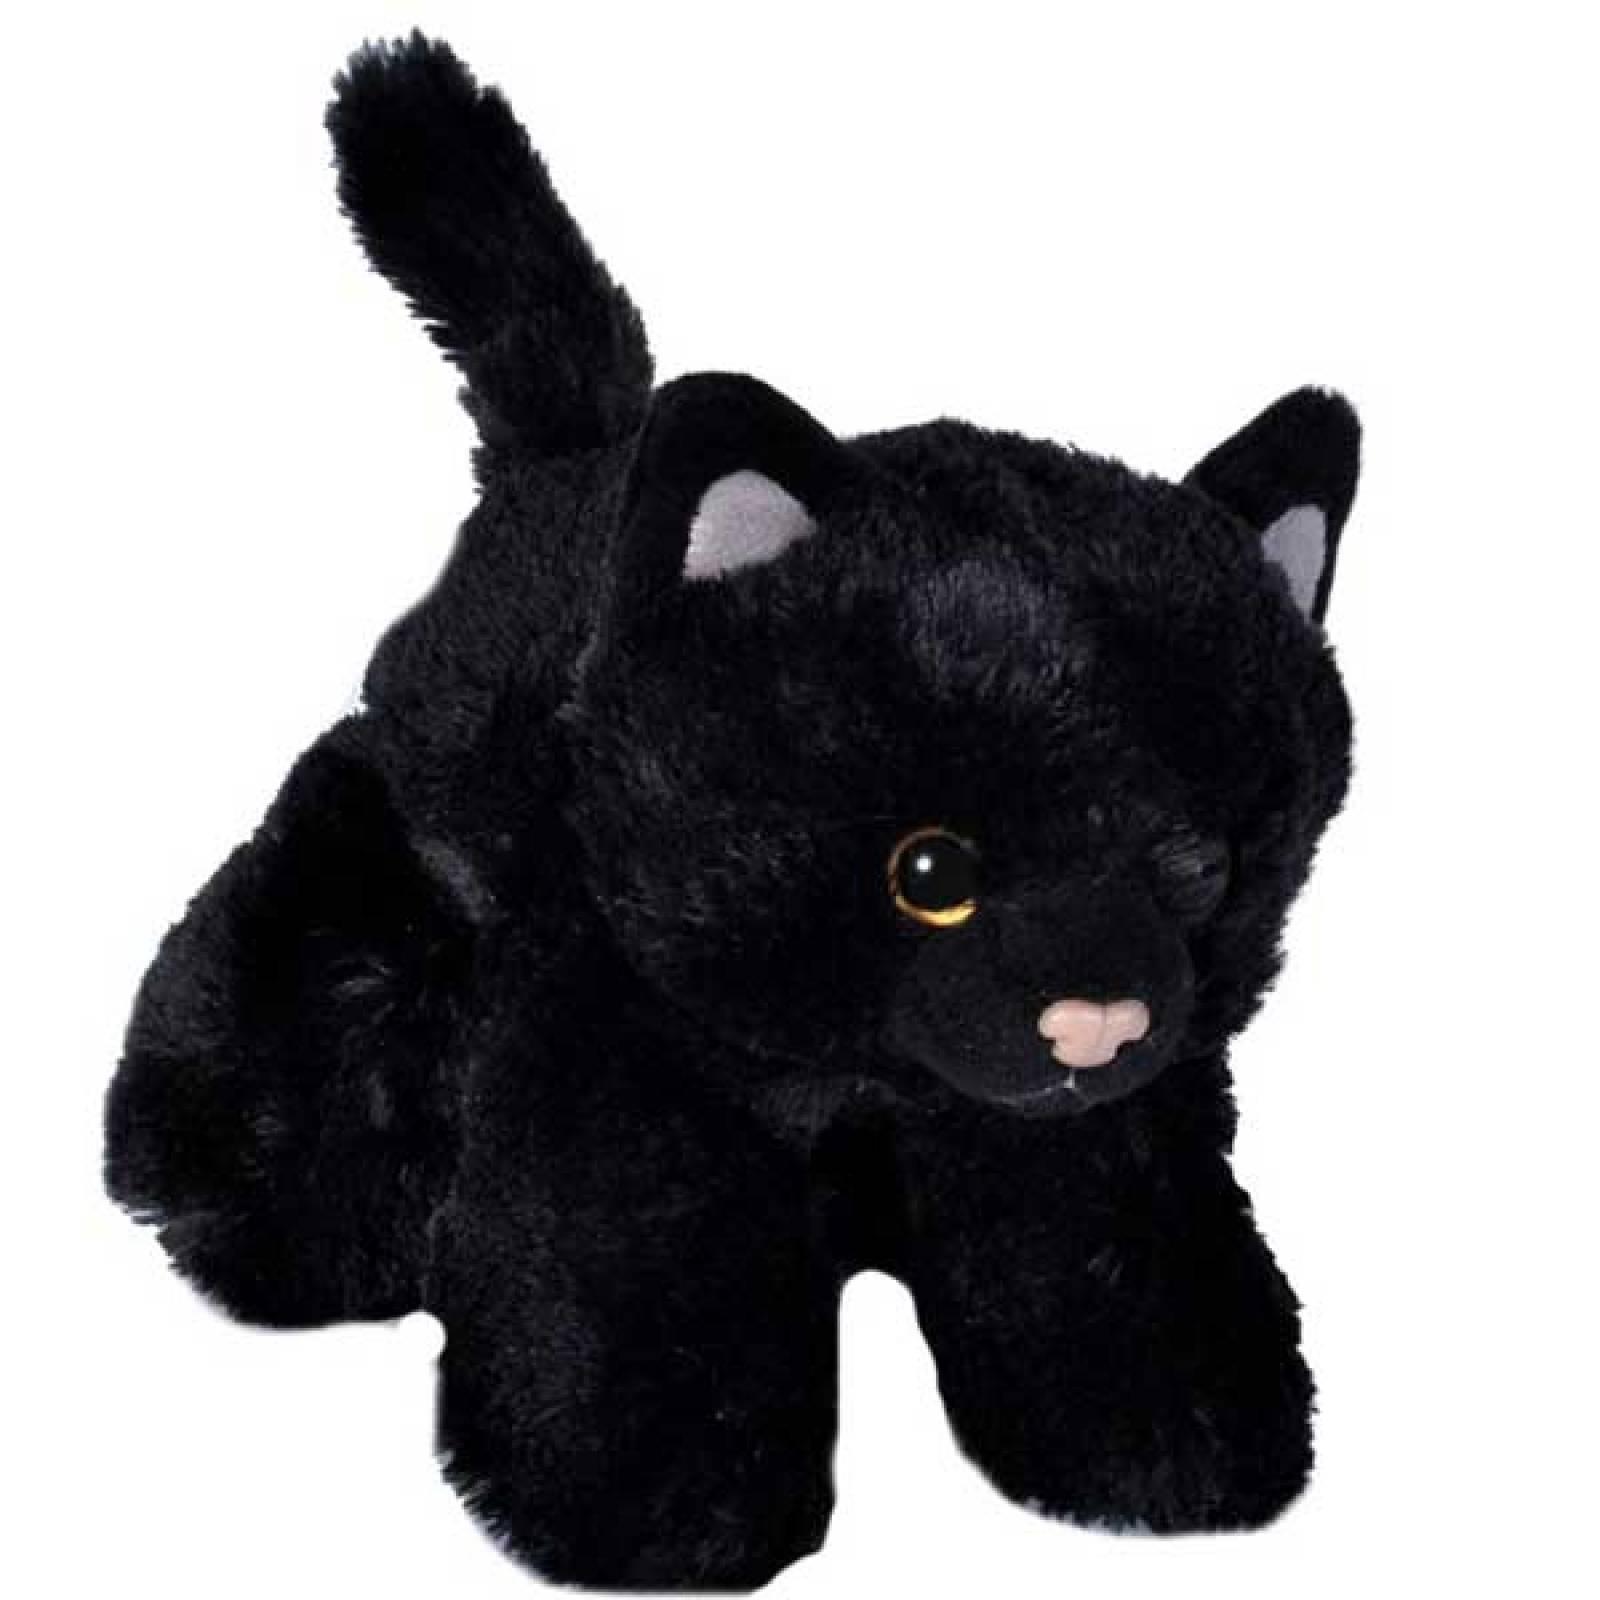 Black Cat Soft Toy 18cm